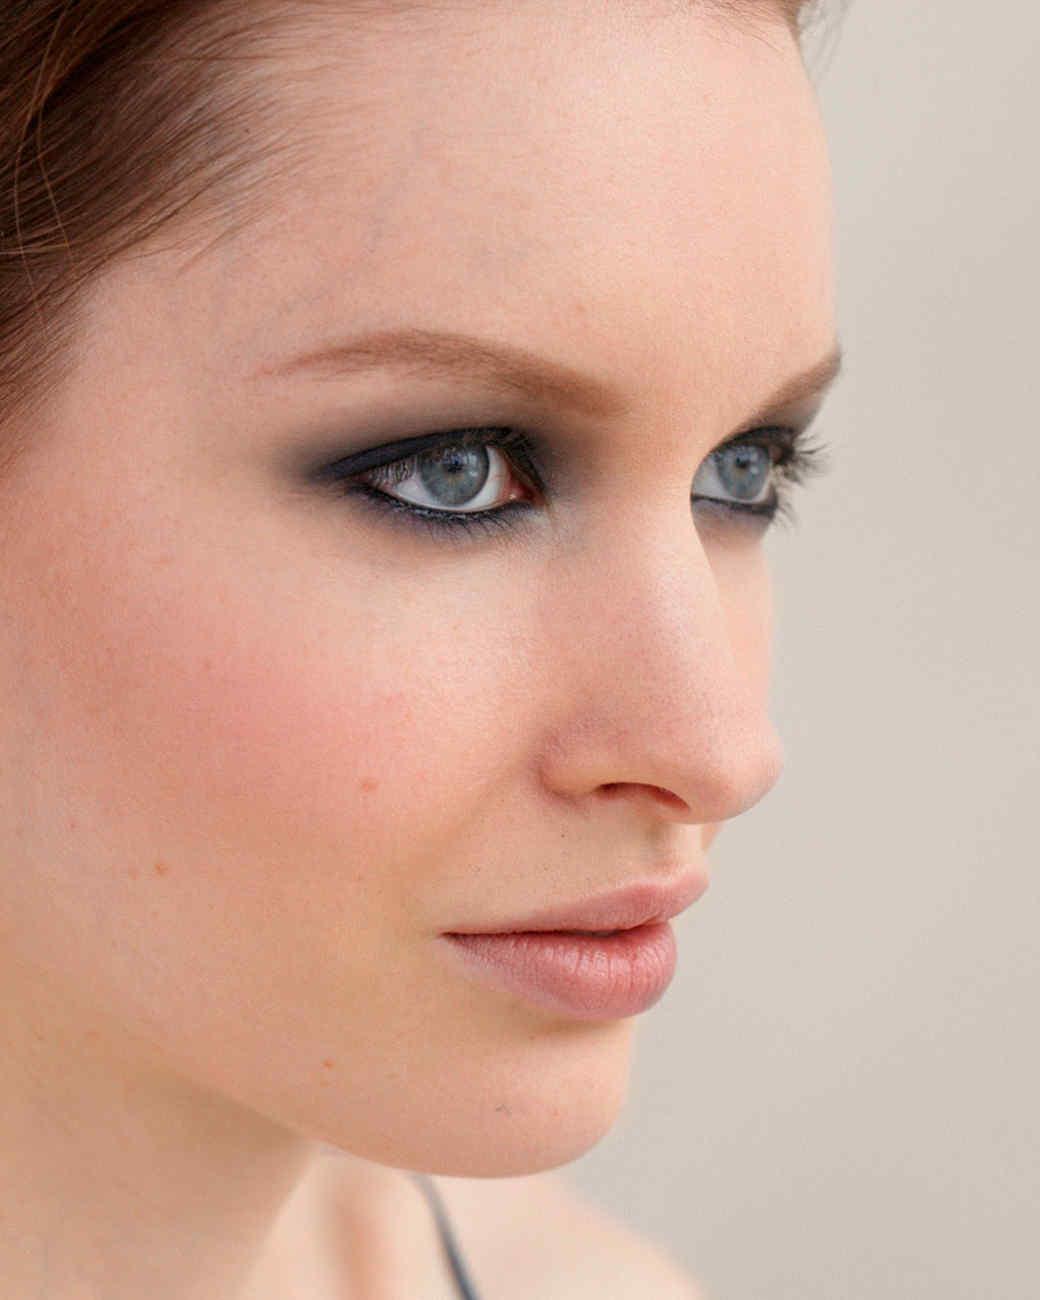 beauty-center-smokey-eyes-4-d108198.jpg